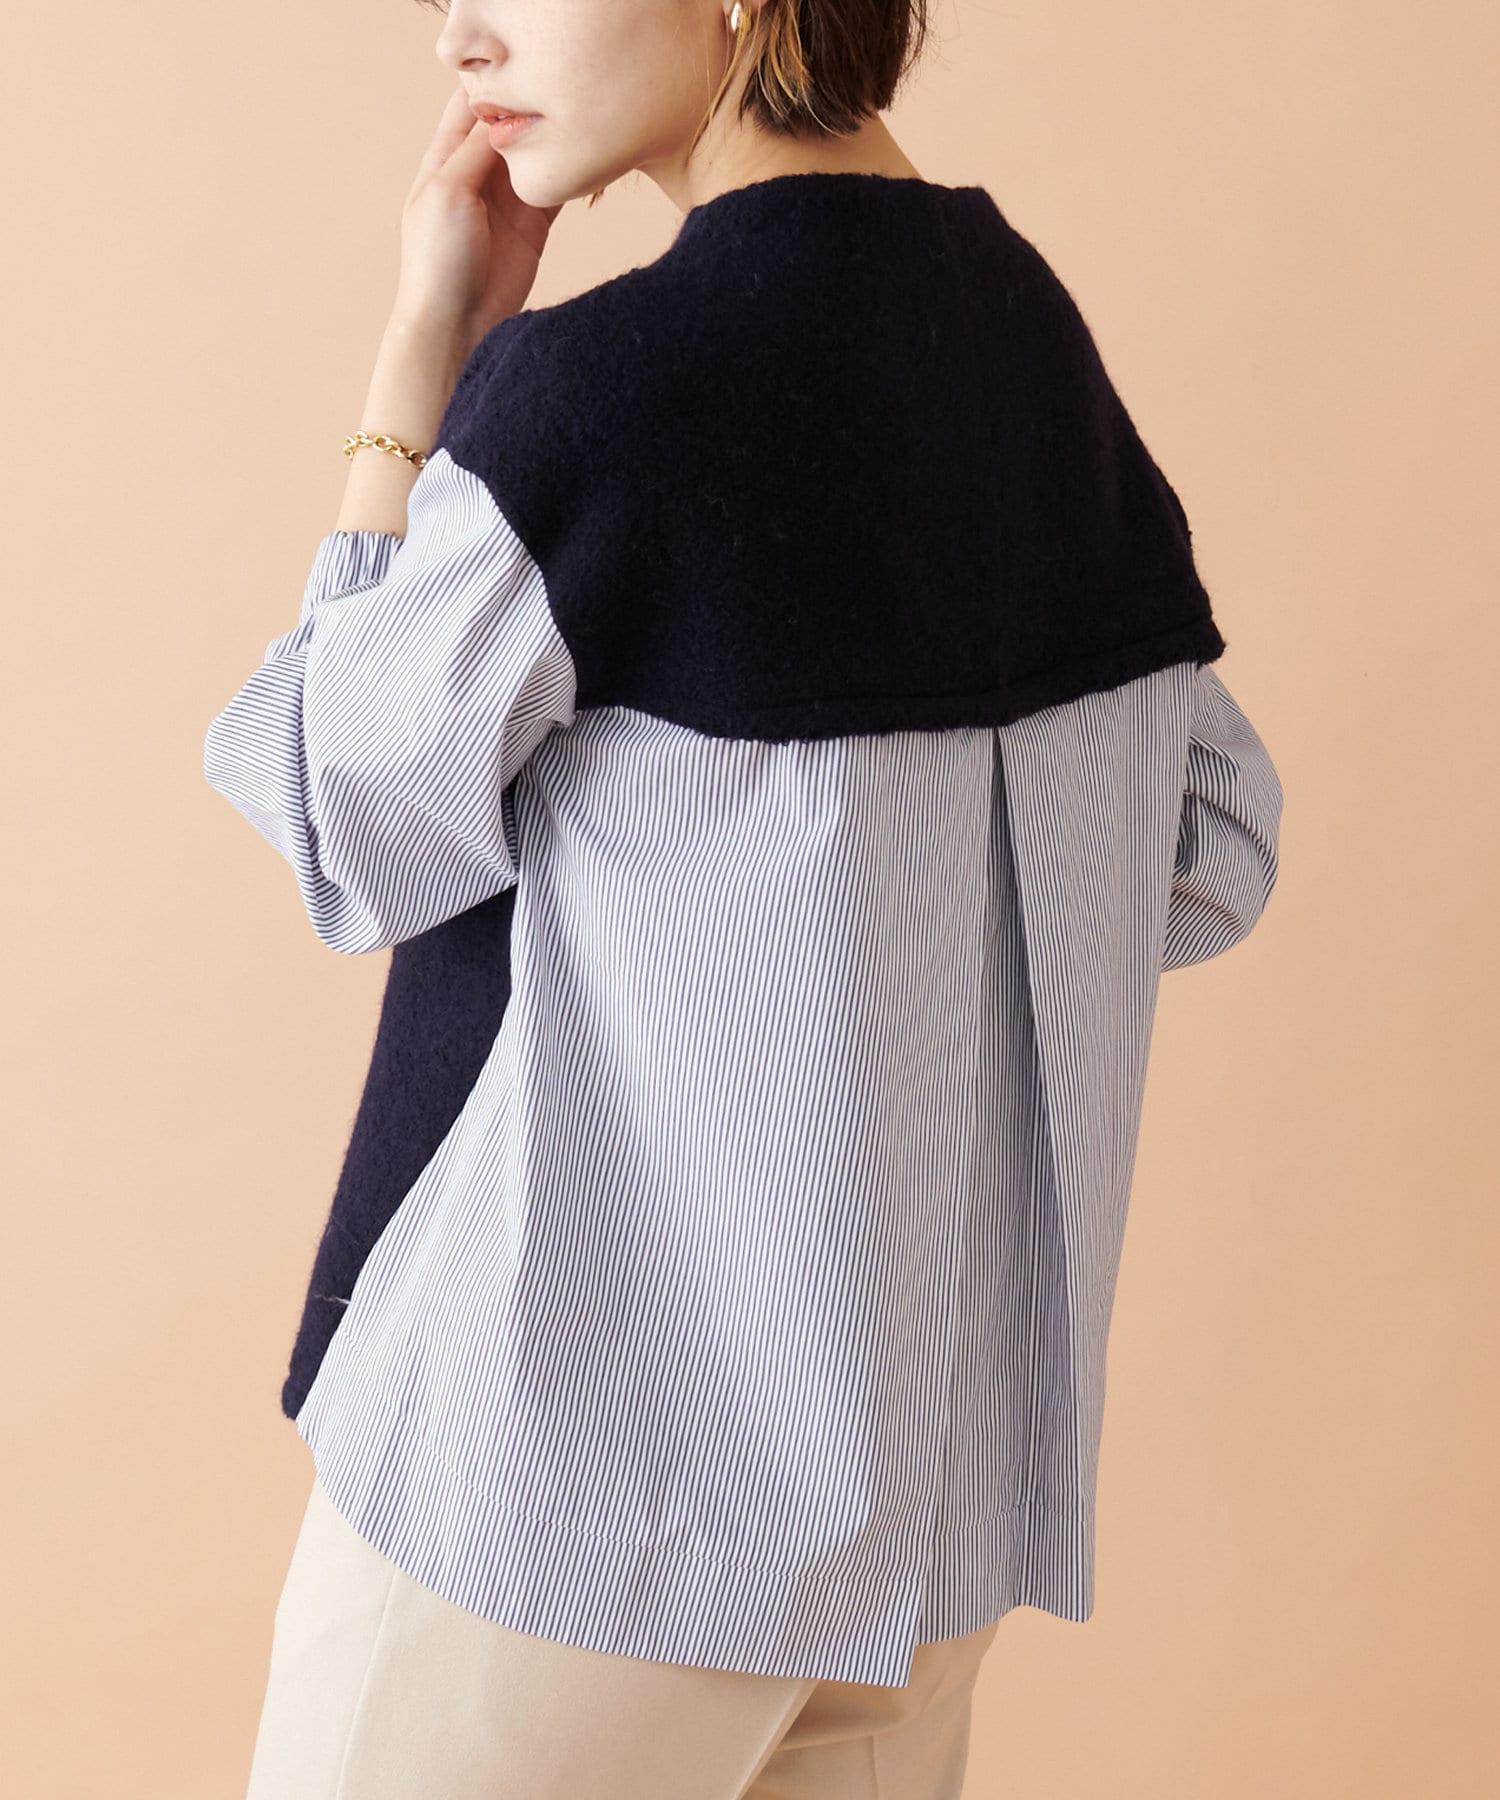 COLLAGE GALLARDAGALANTE(コラージュ ガリャルダガランテ) ☆COLLAGE定番☆ニットシャツコンビプルオーバー